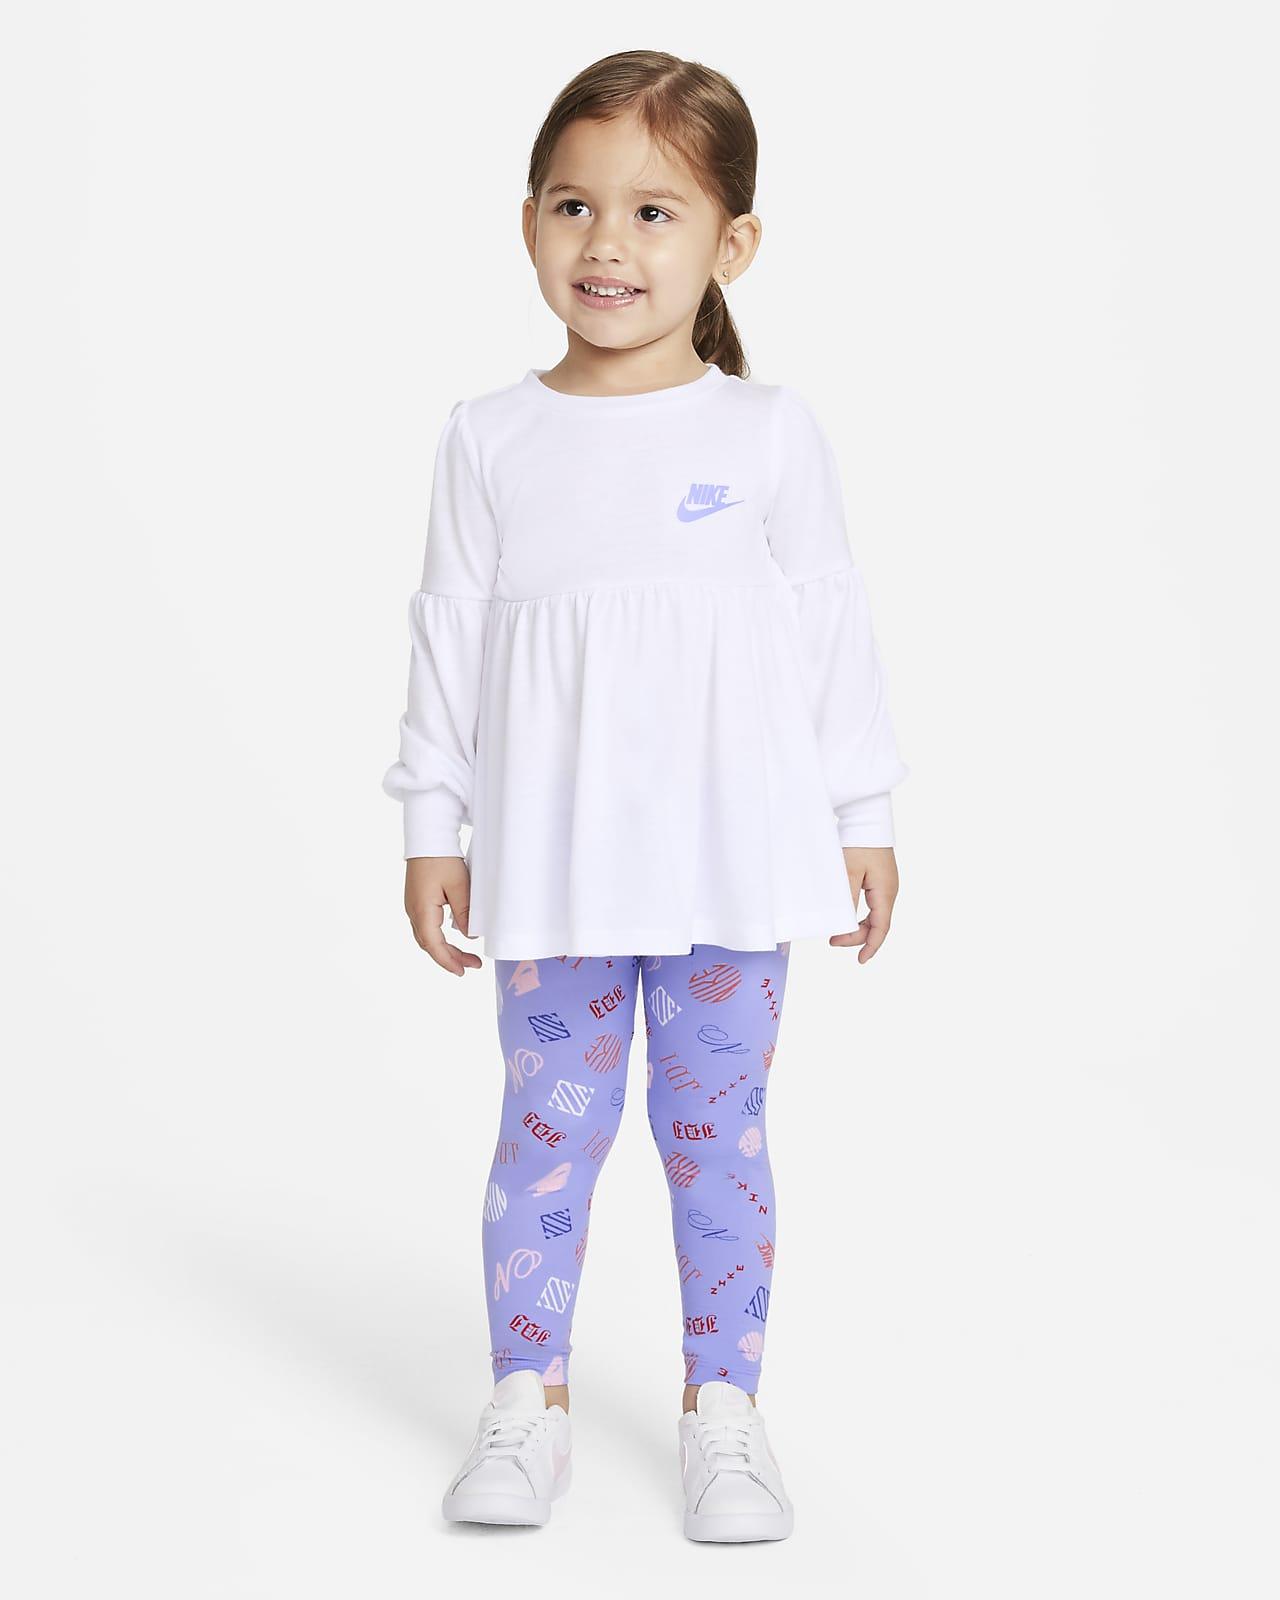 Nike Toddler Top and Leggings Set